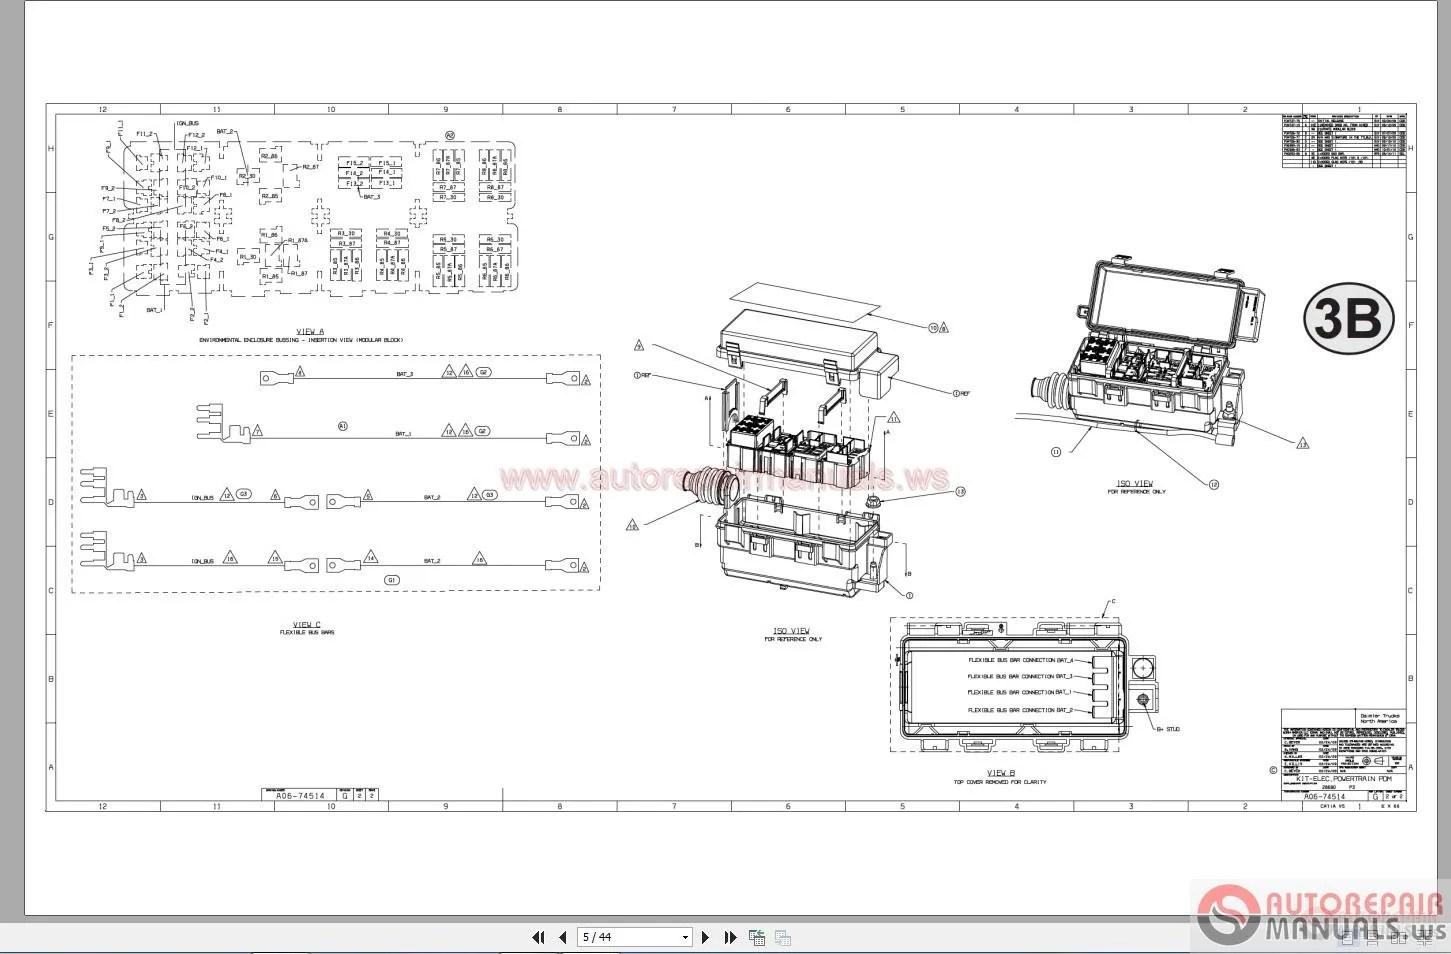 hight resolution of 1981 international truck fuse box diagram